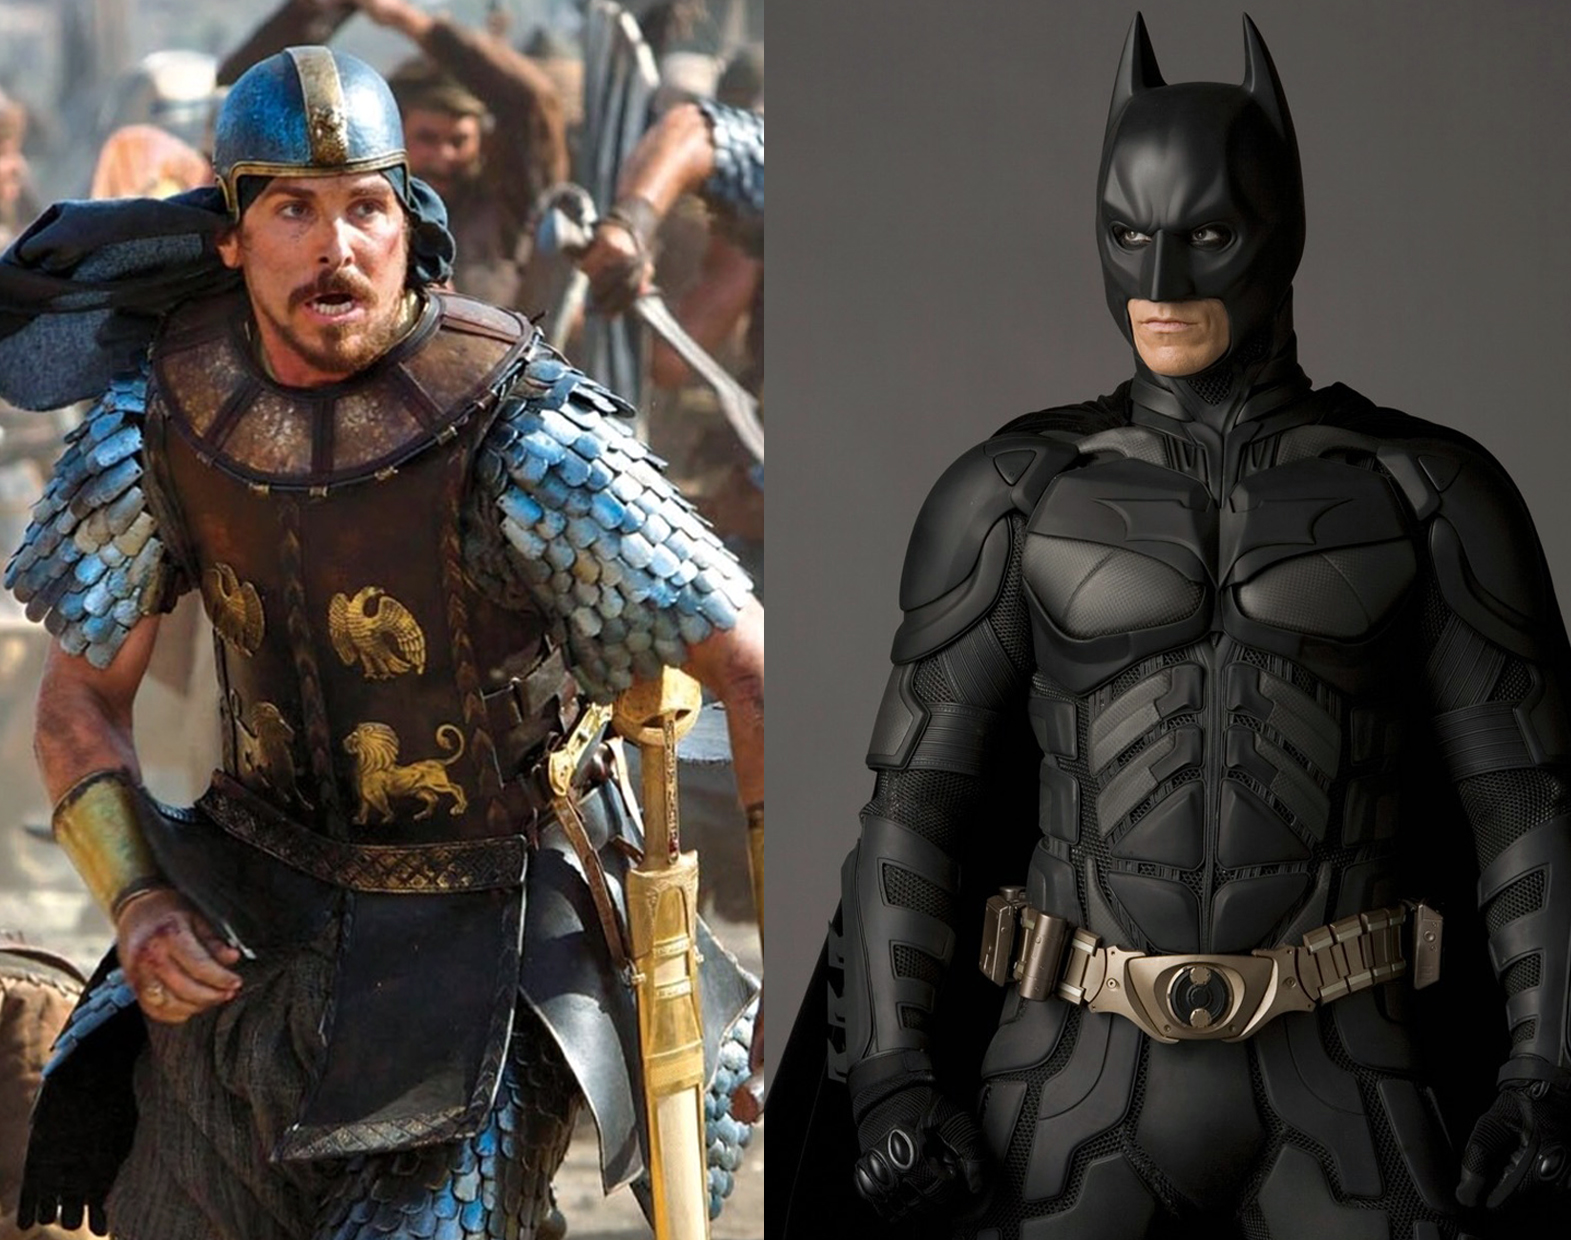 Trailer Talk: Who is swankier, Moses or Batman?